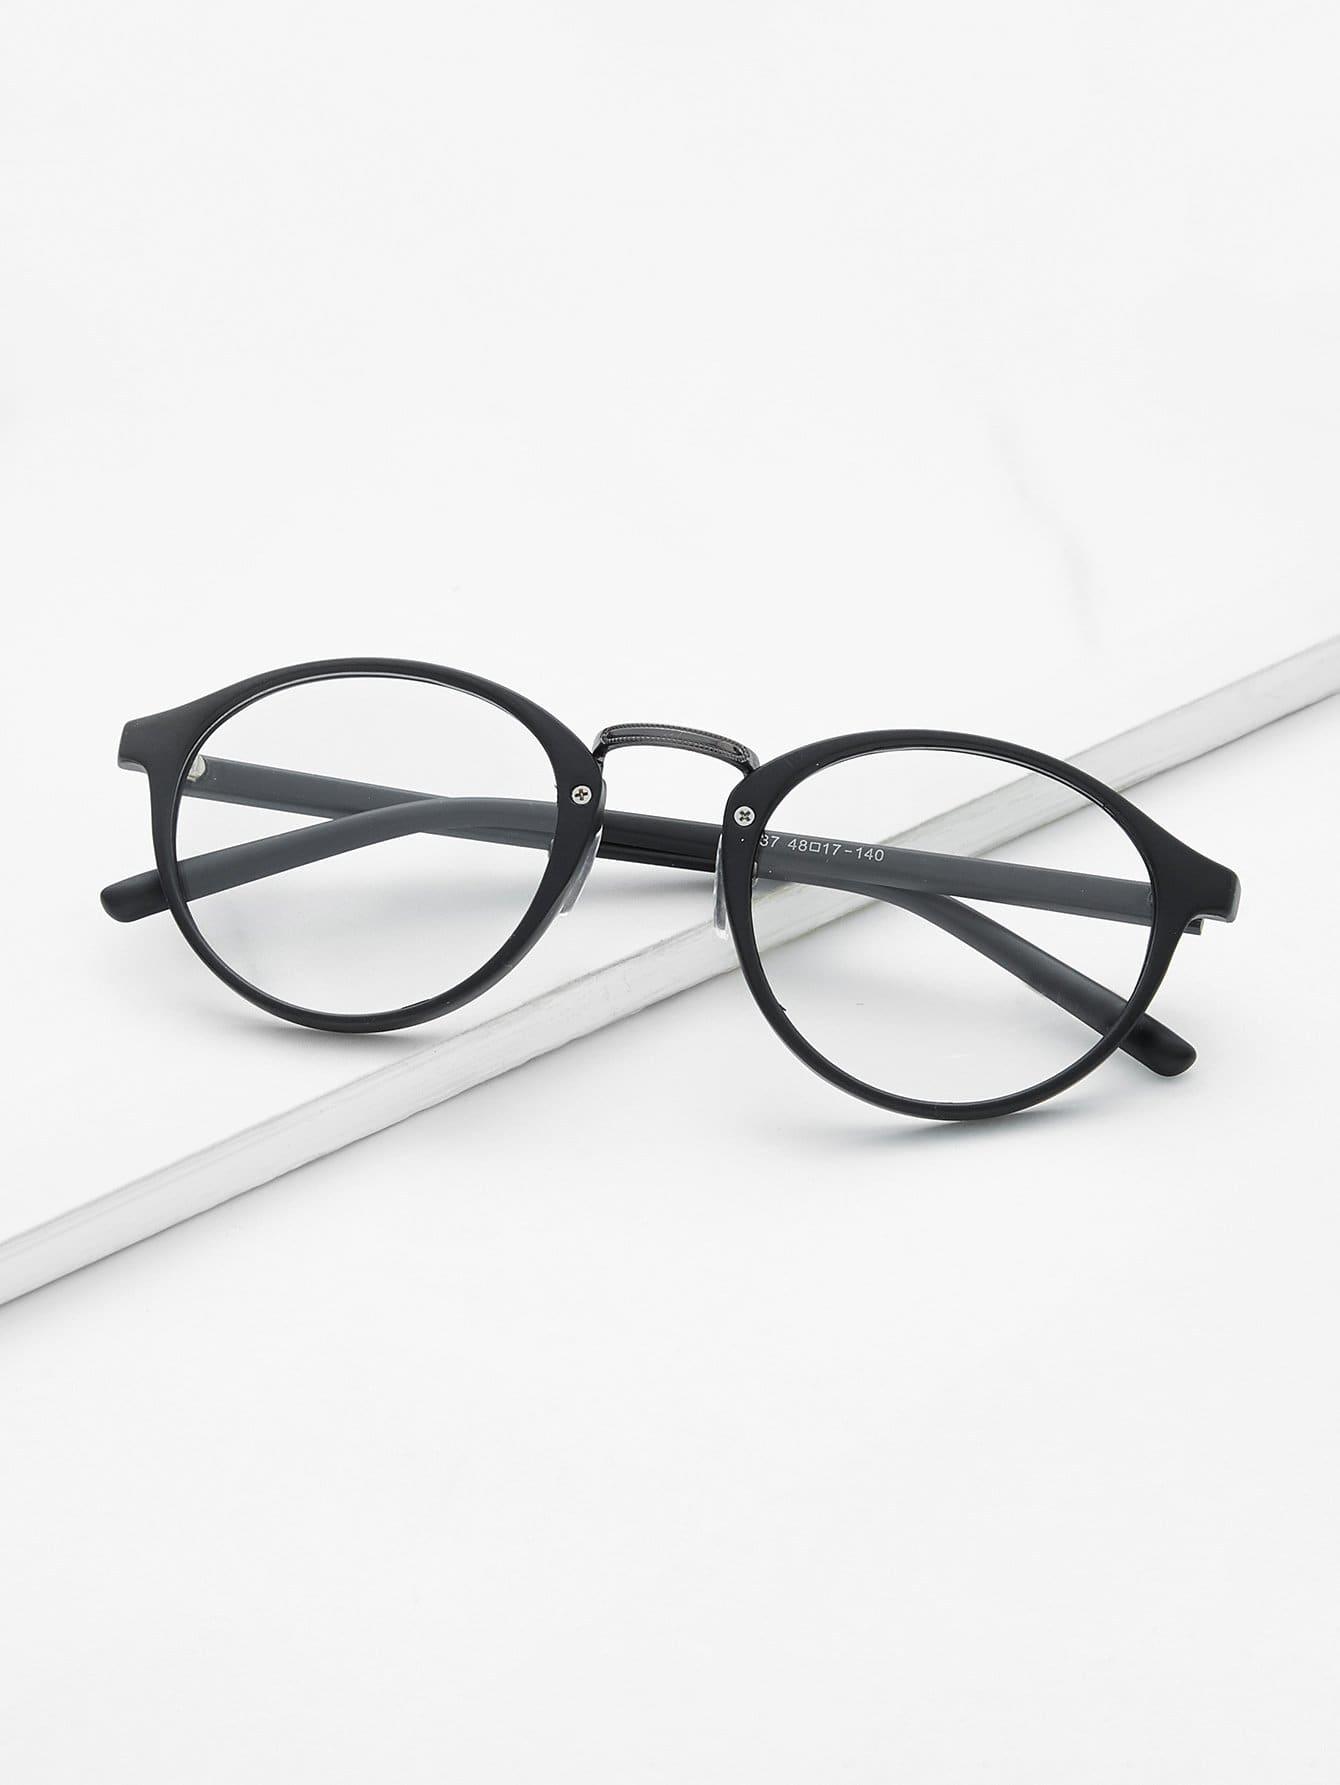 Black Frame Clear Lens Glasses black open frame gold trim glasses